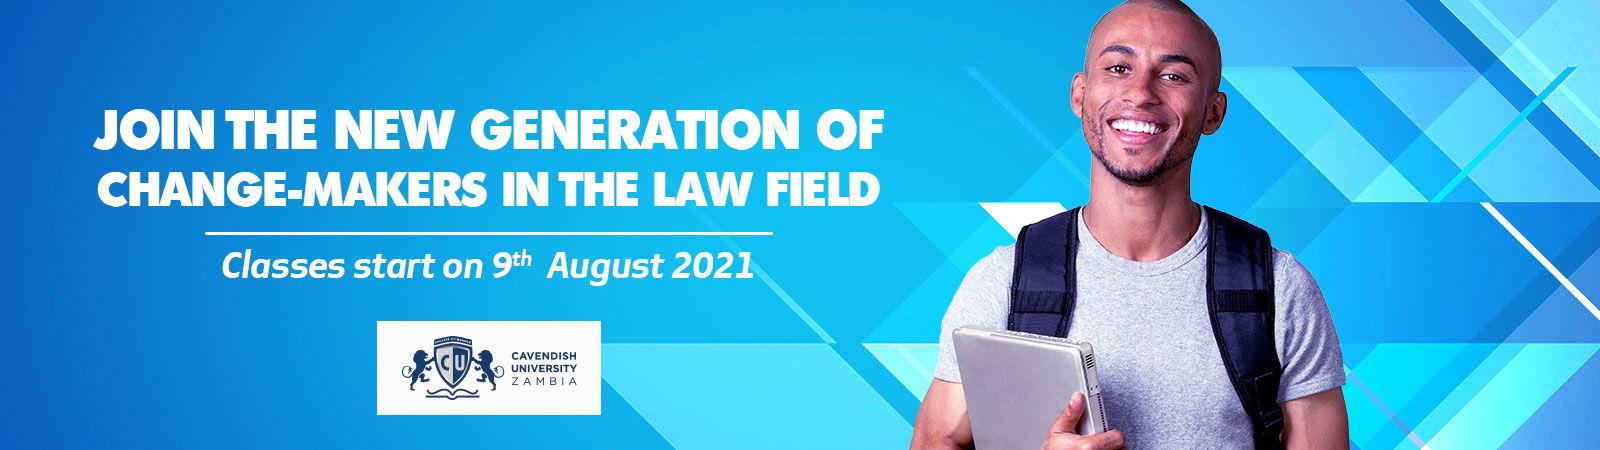 Study Law In Cavendish University